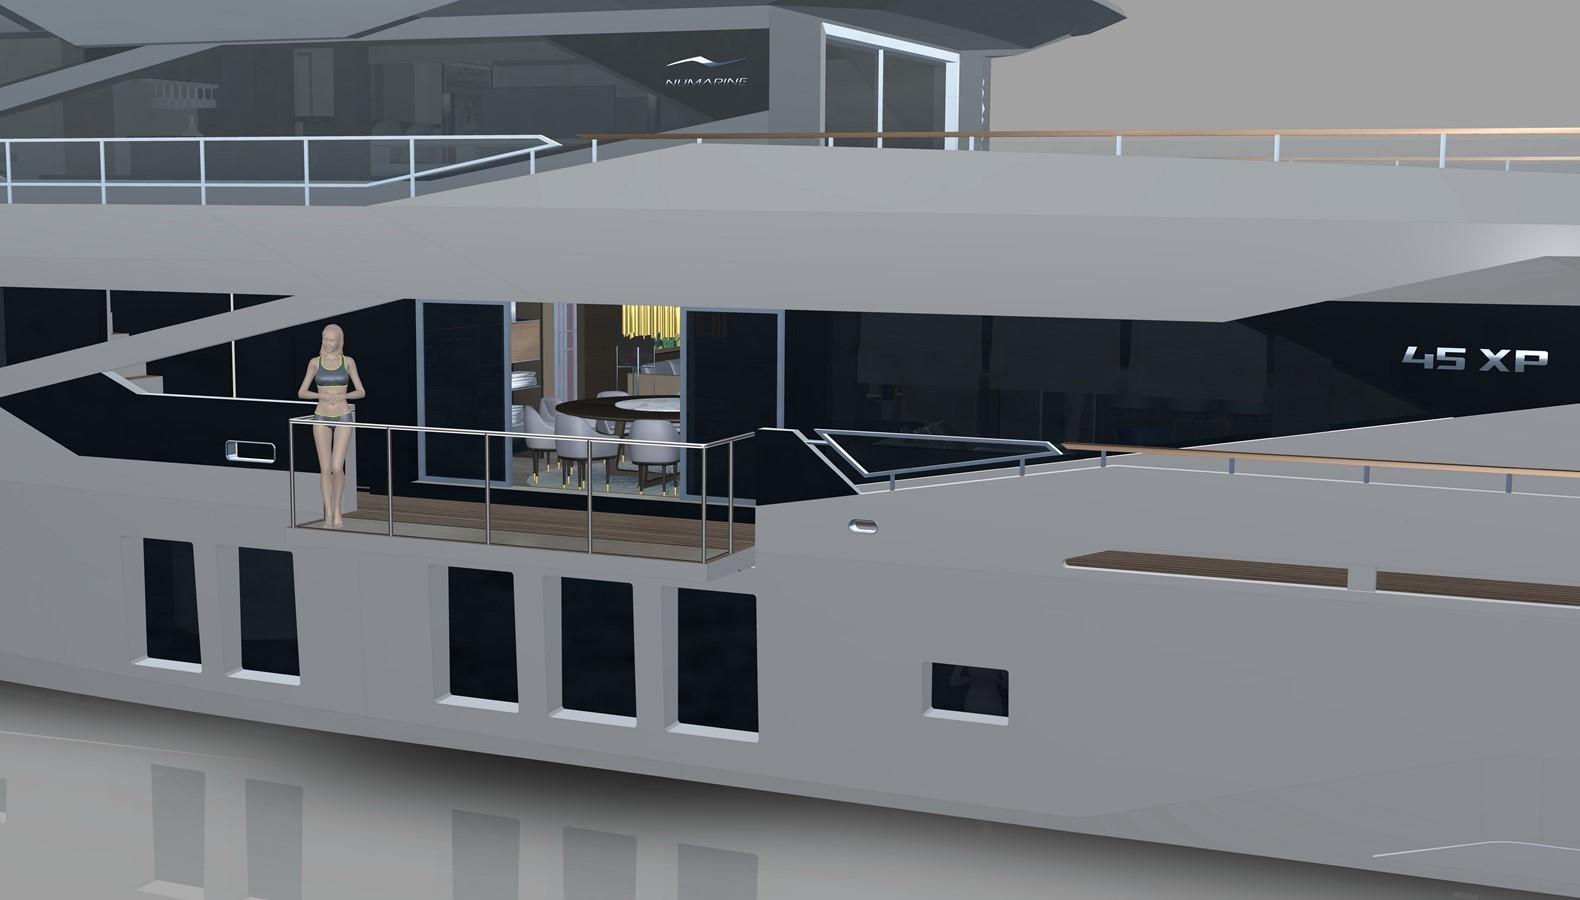 2021 NUMARINE 45XP Expedition Yacht 2549310